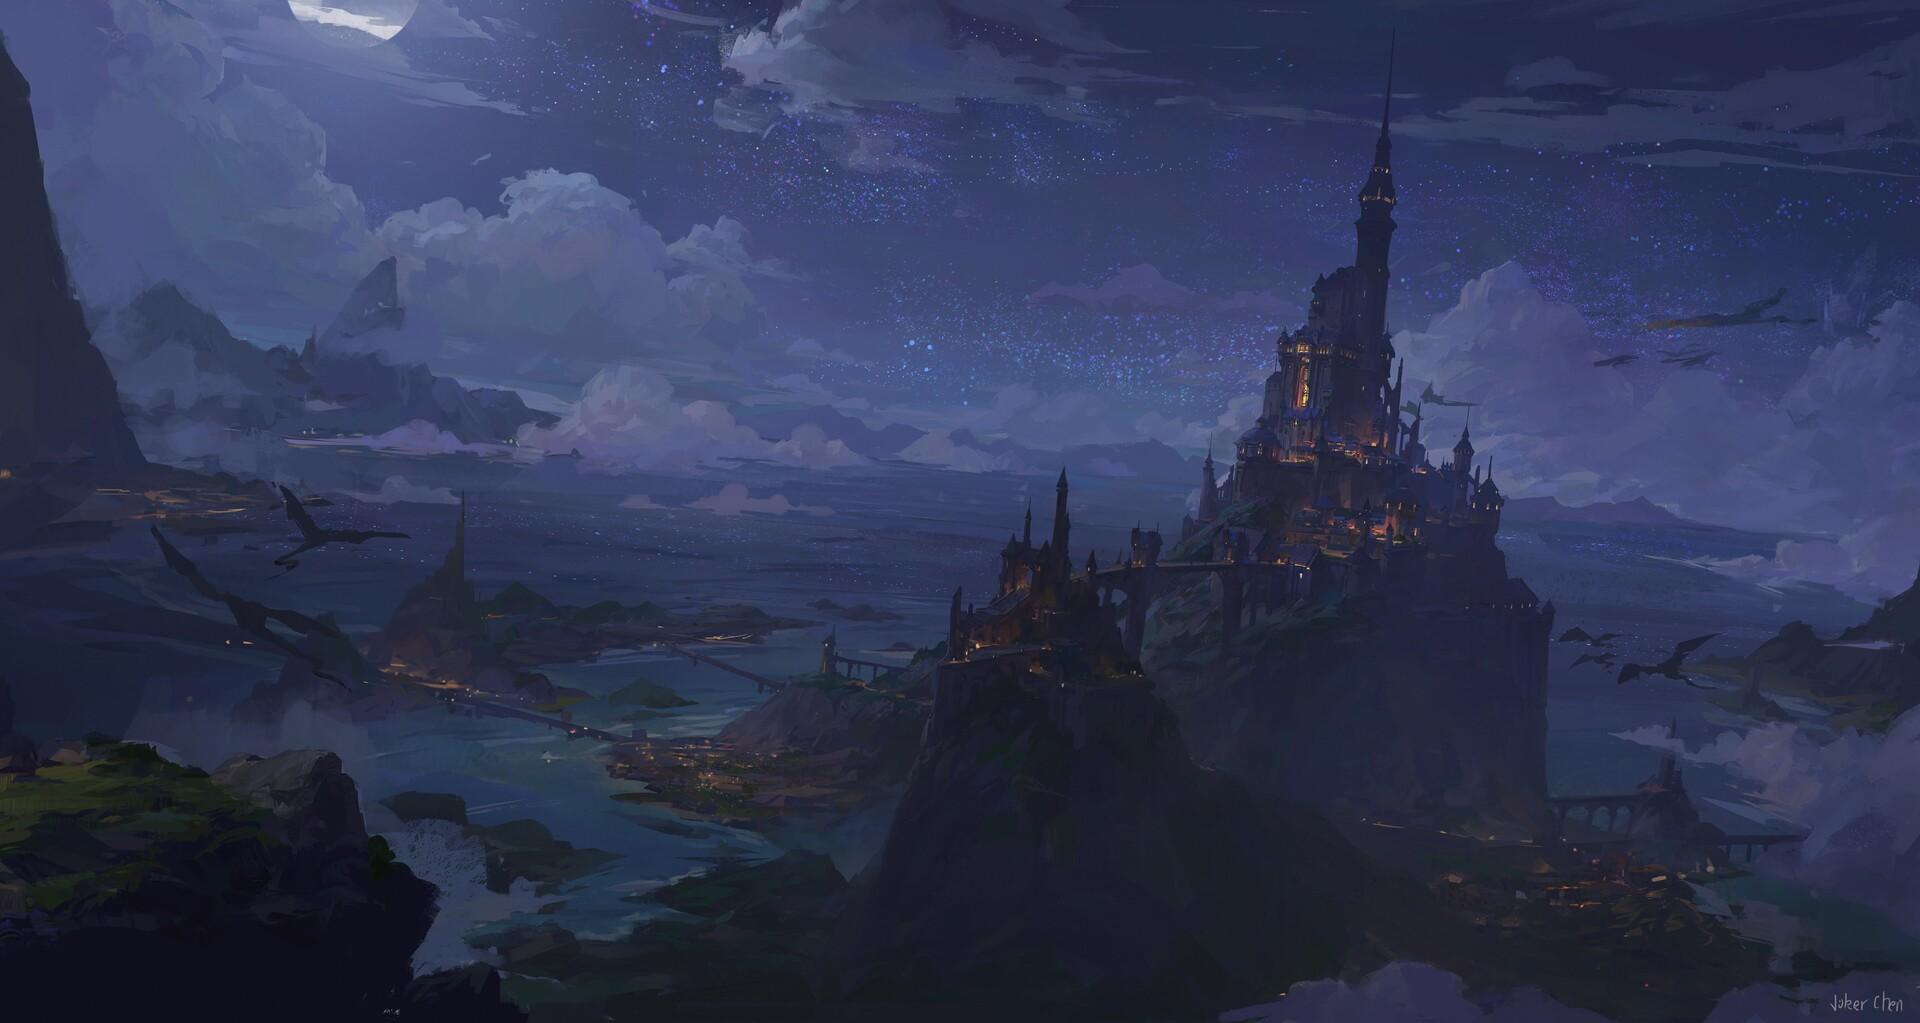 The dark fairy castle